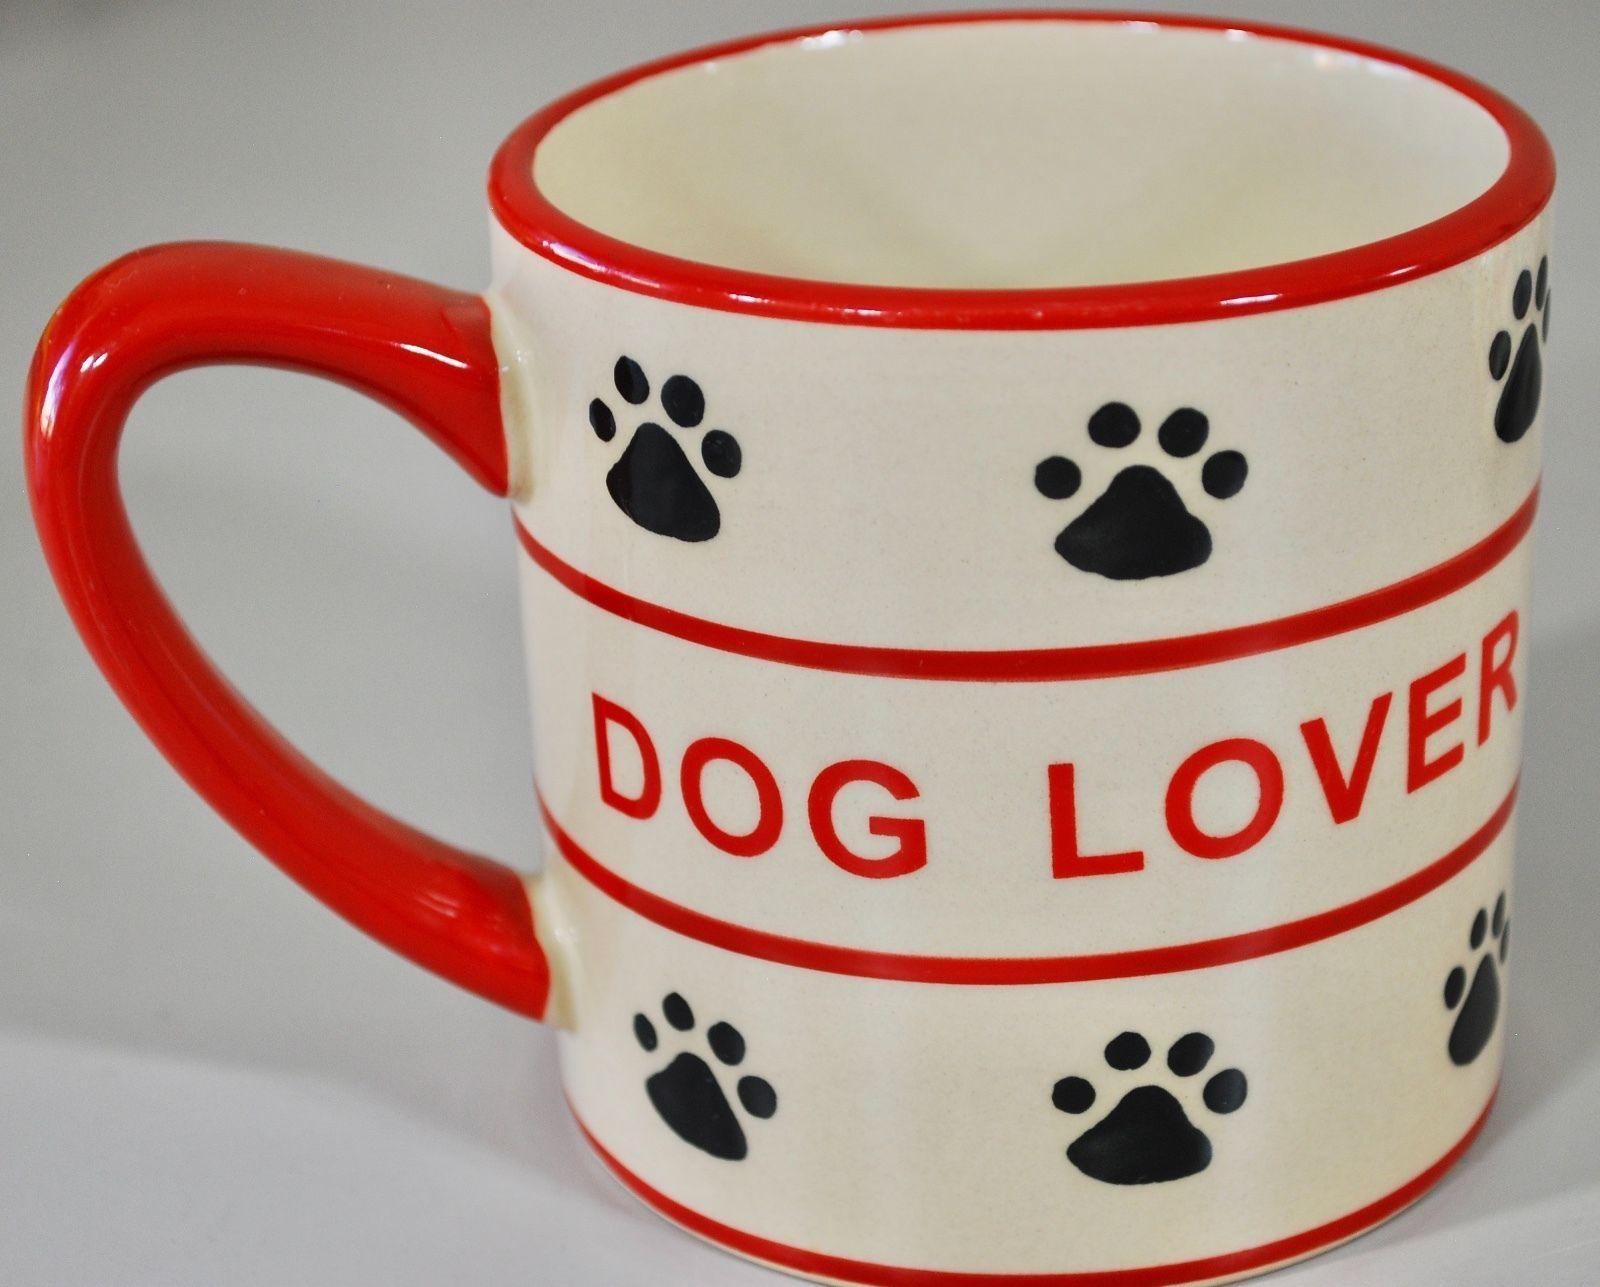 """Dog Lover"" Coffee Mug - Paw Prints  - Pets Animals Puppies Dog Mom Family"